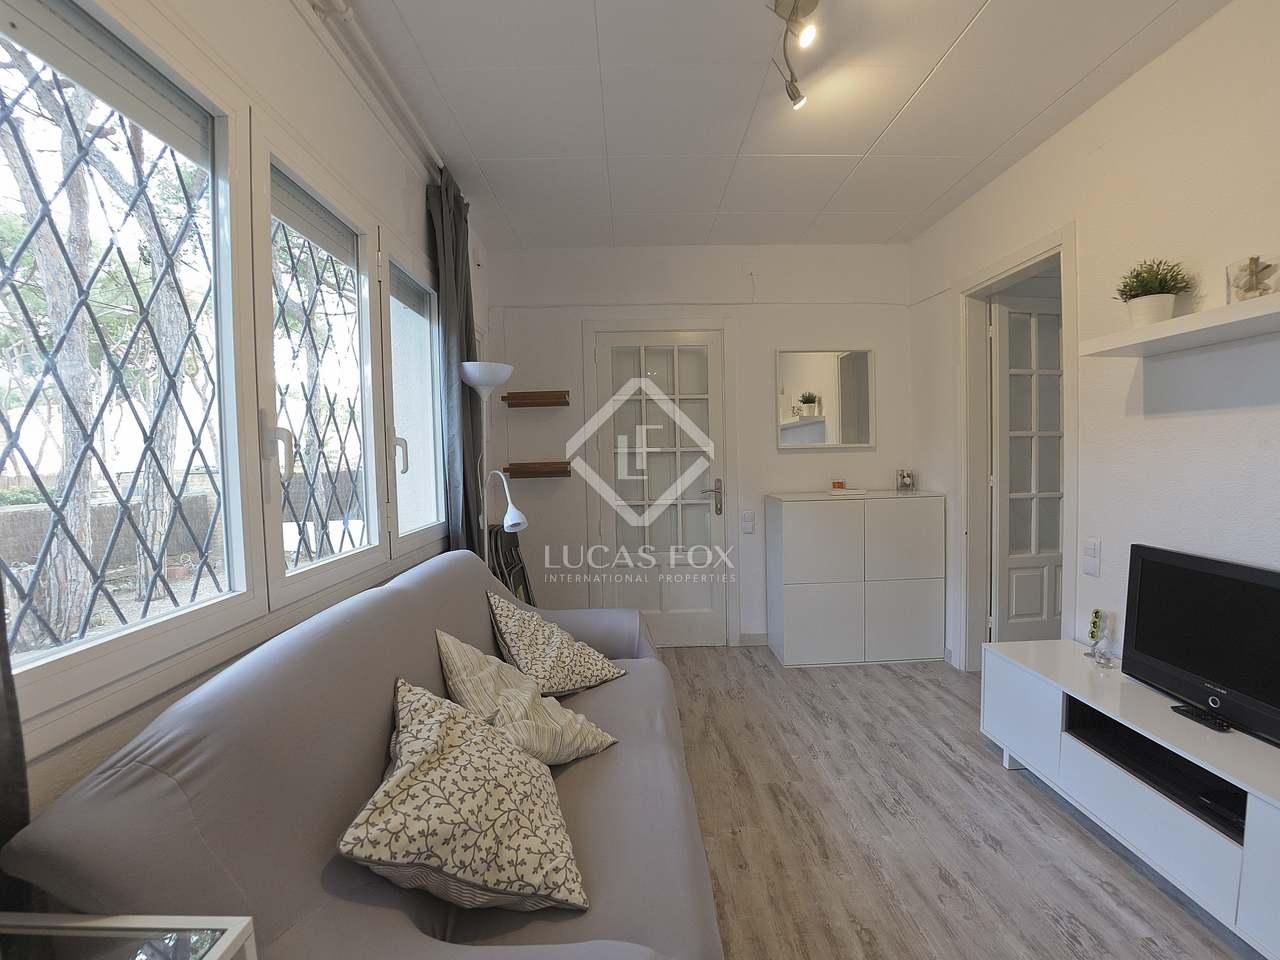 Casa de 75 m en alquiler en castelldefels barcelona for Casa con jardin barcelona alquiler